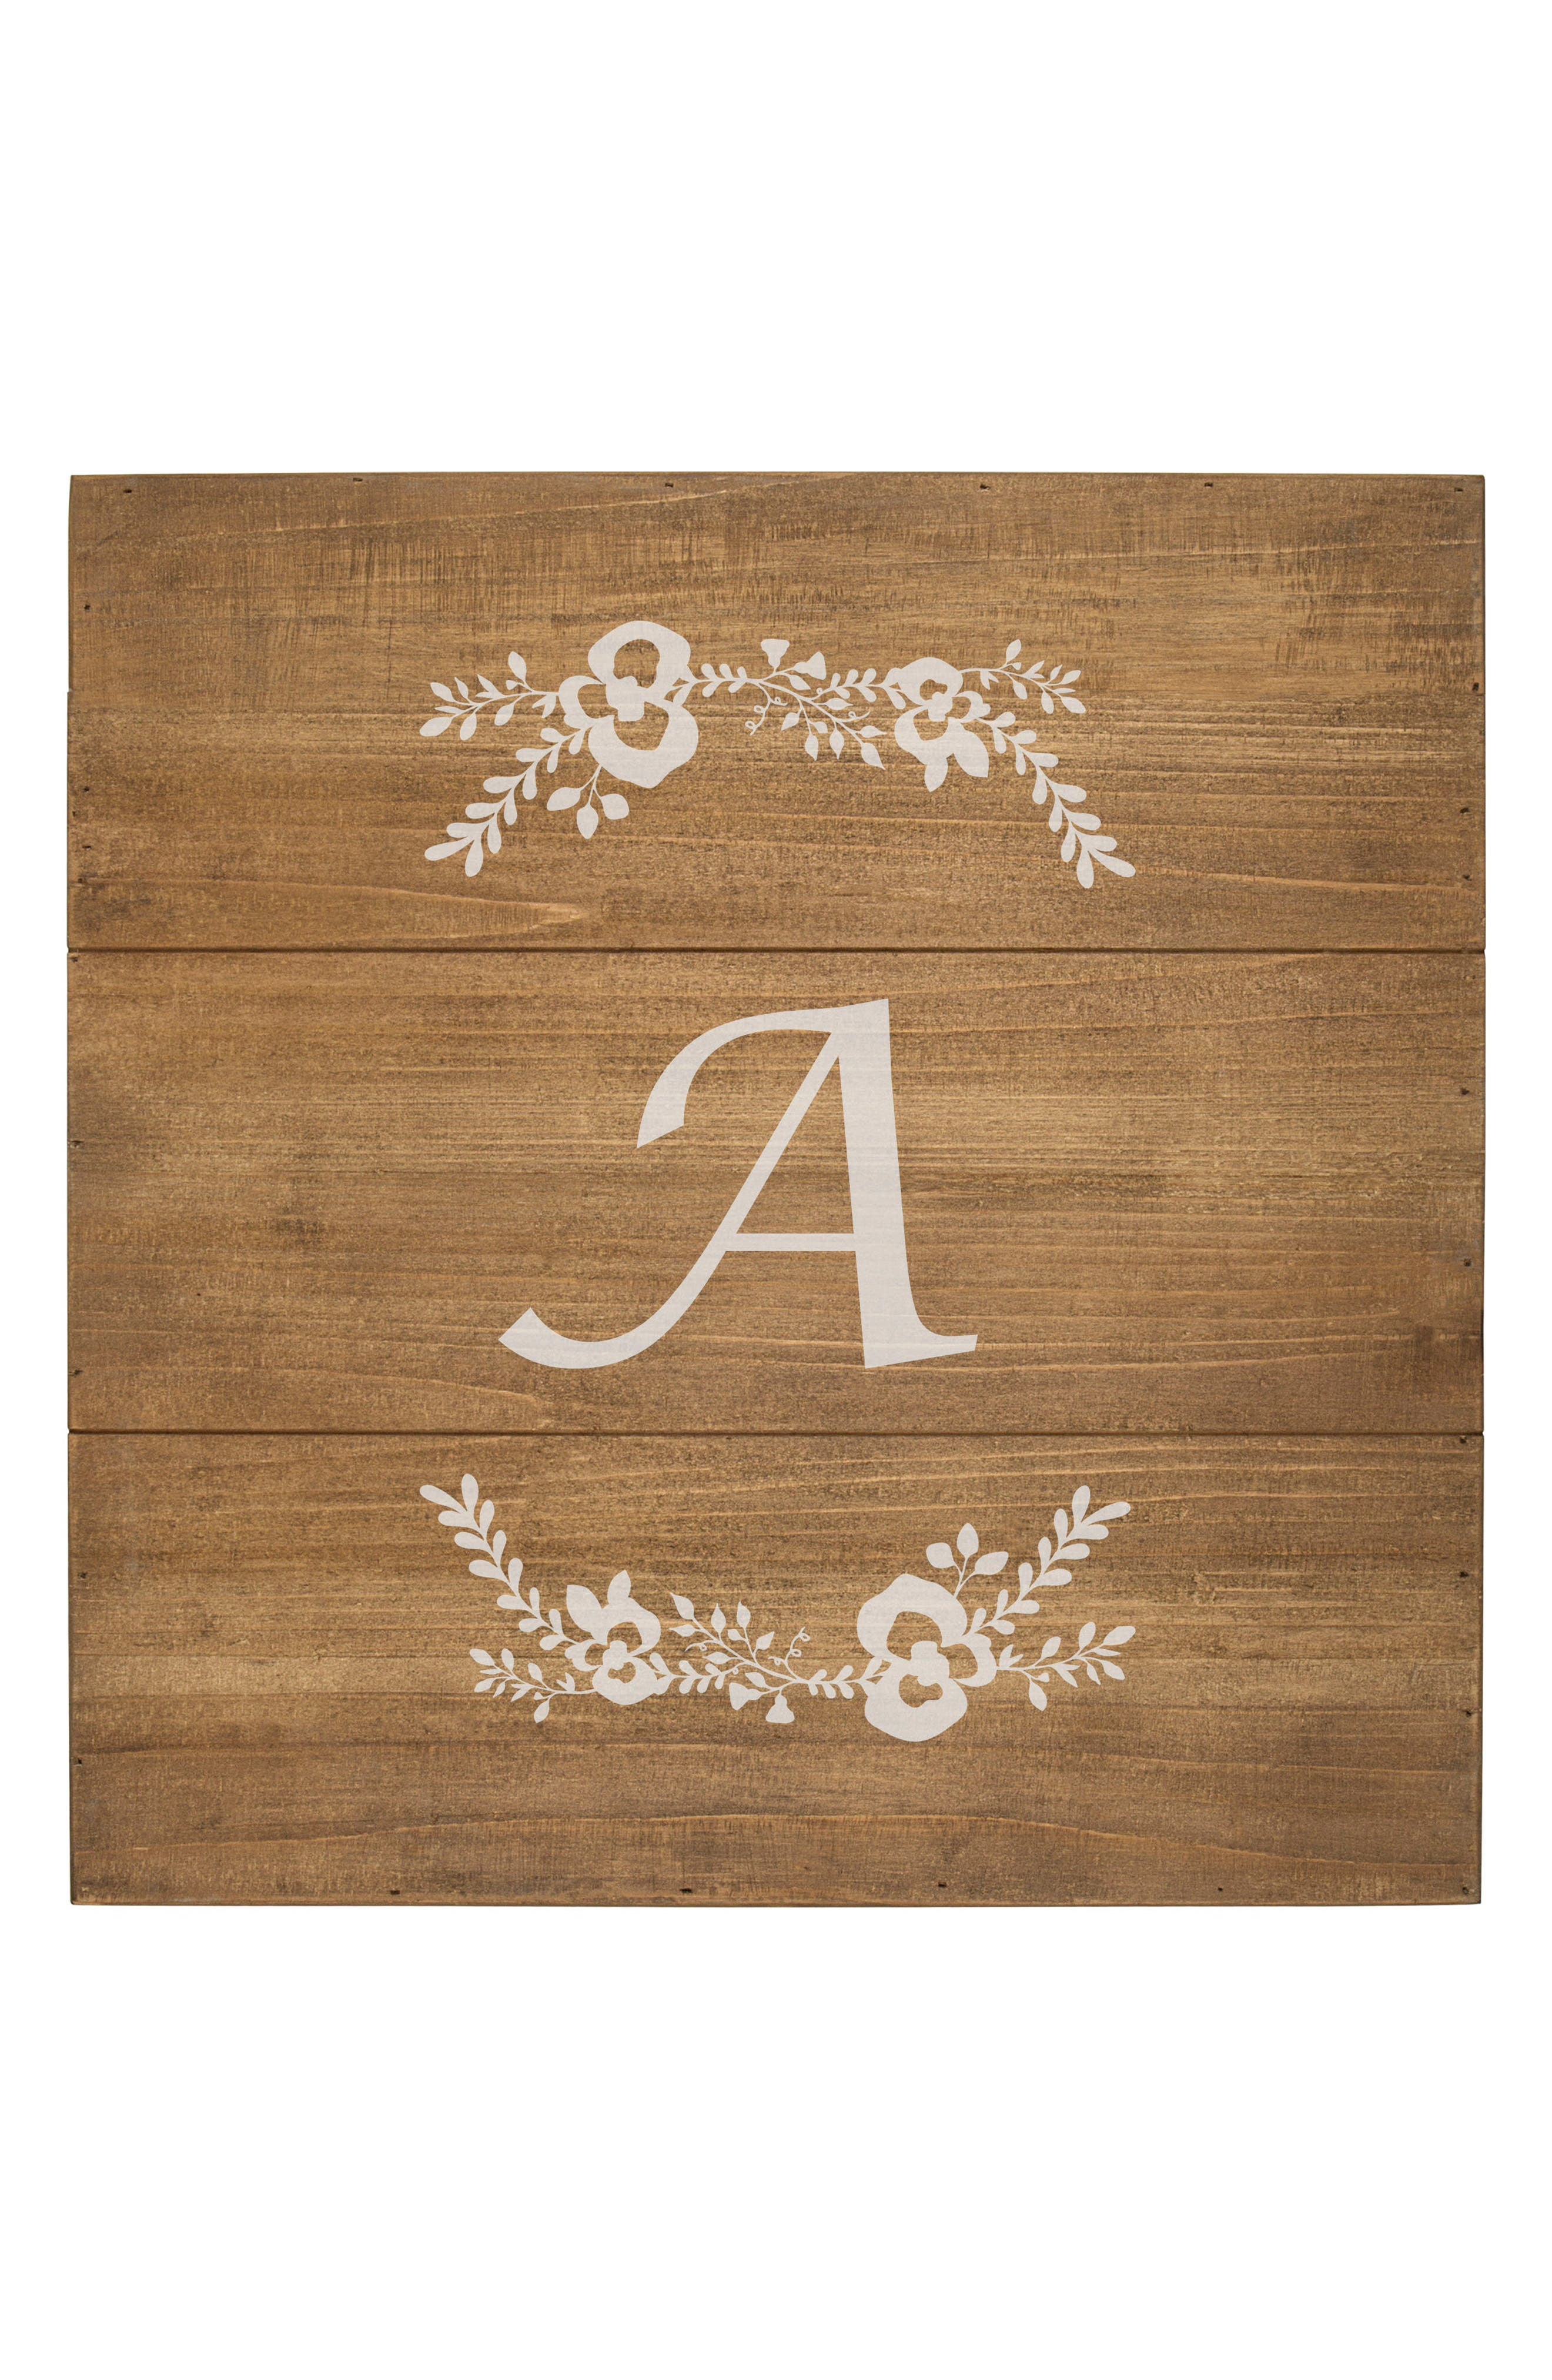 Monogram Rustic Wood Sign,                             Alternate thumbnail 2, color,                             A